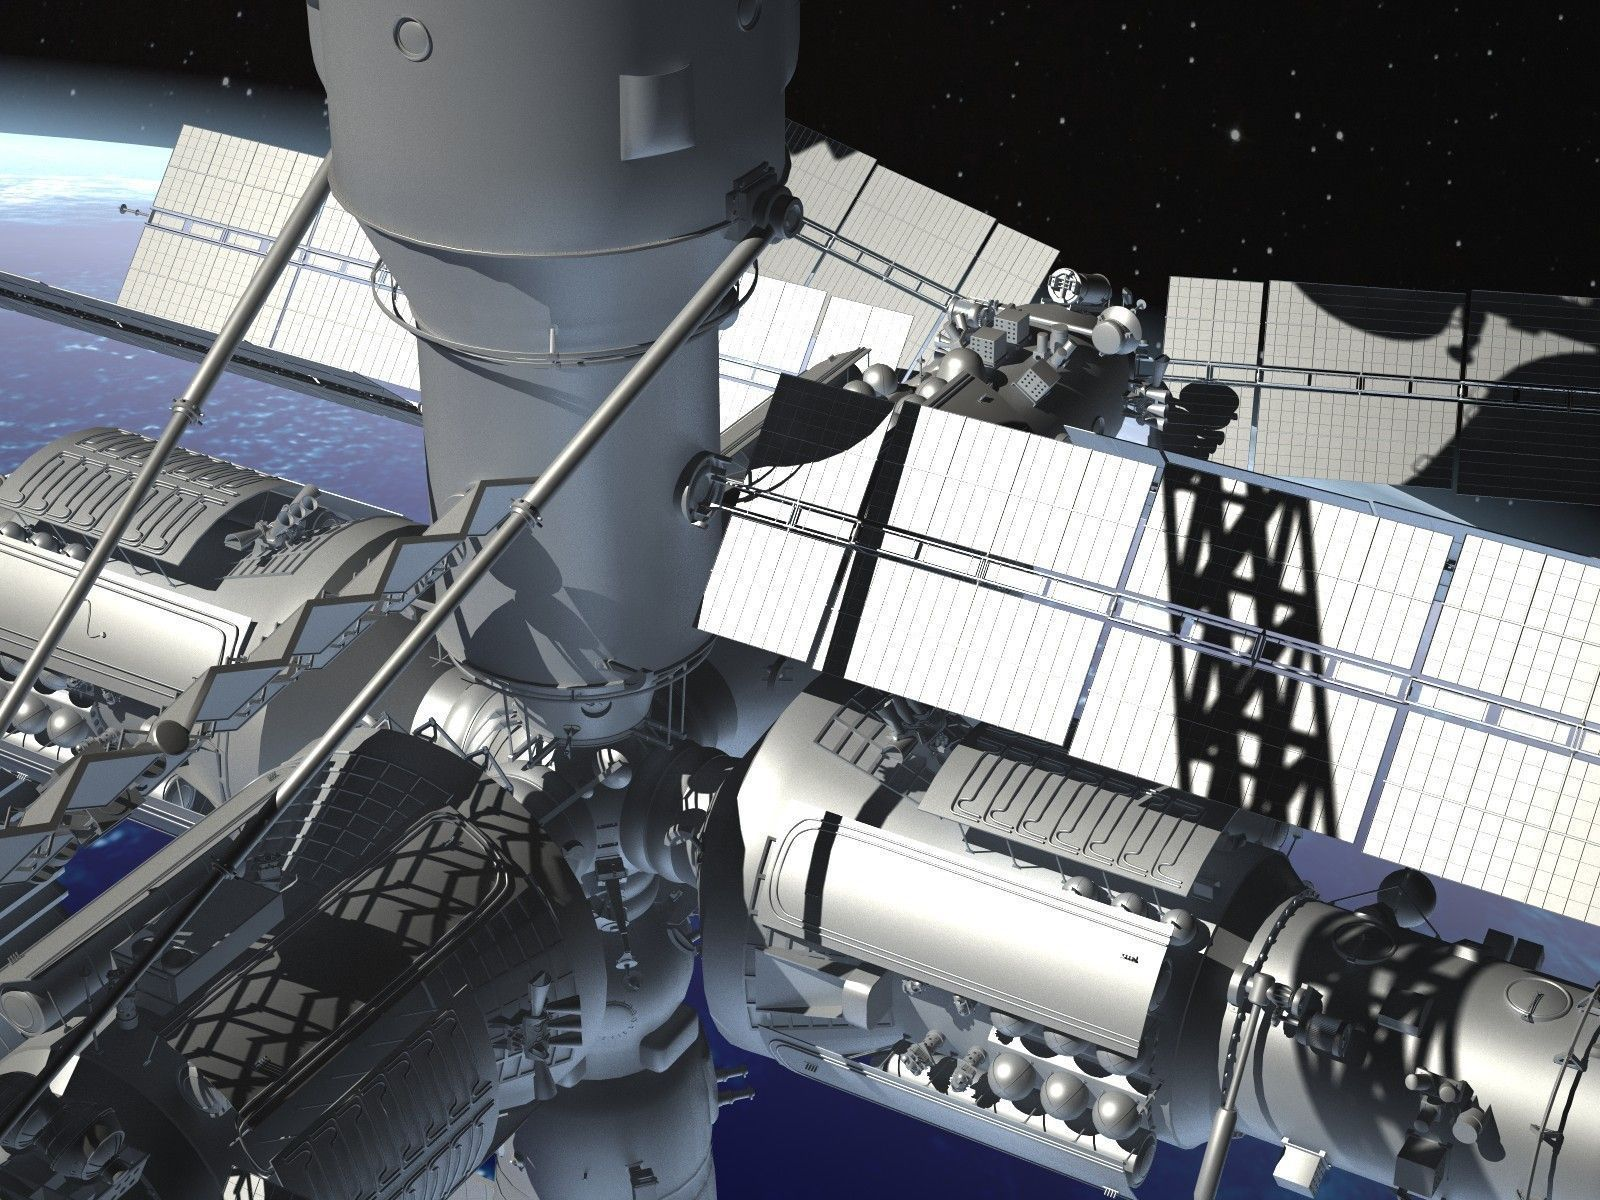 Mir space station complex 3d model max obj 3ds fbx c4d lwo for Space station 13 3d